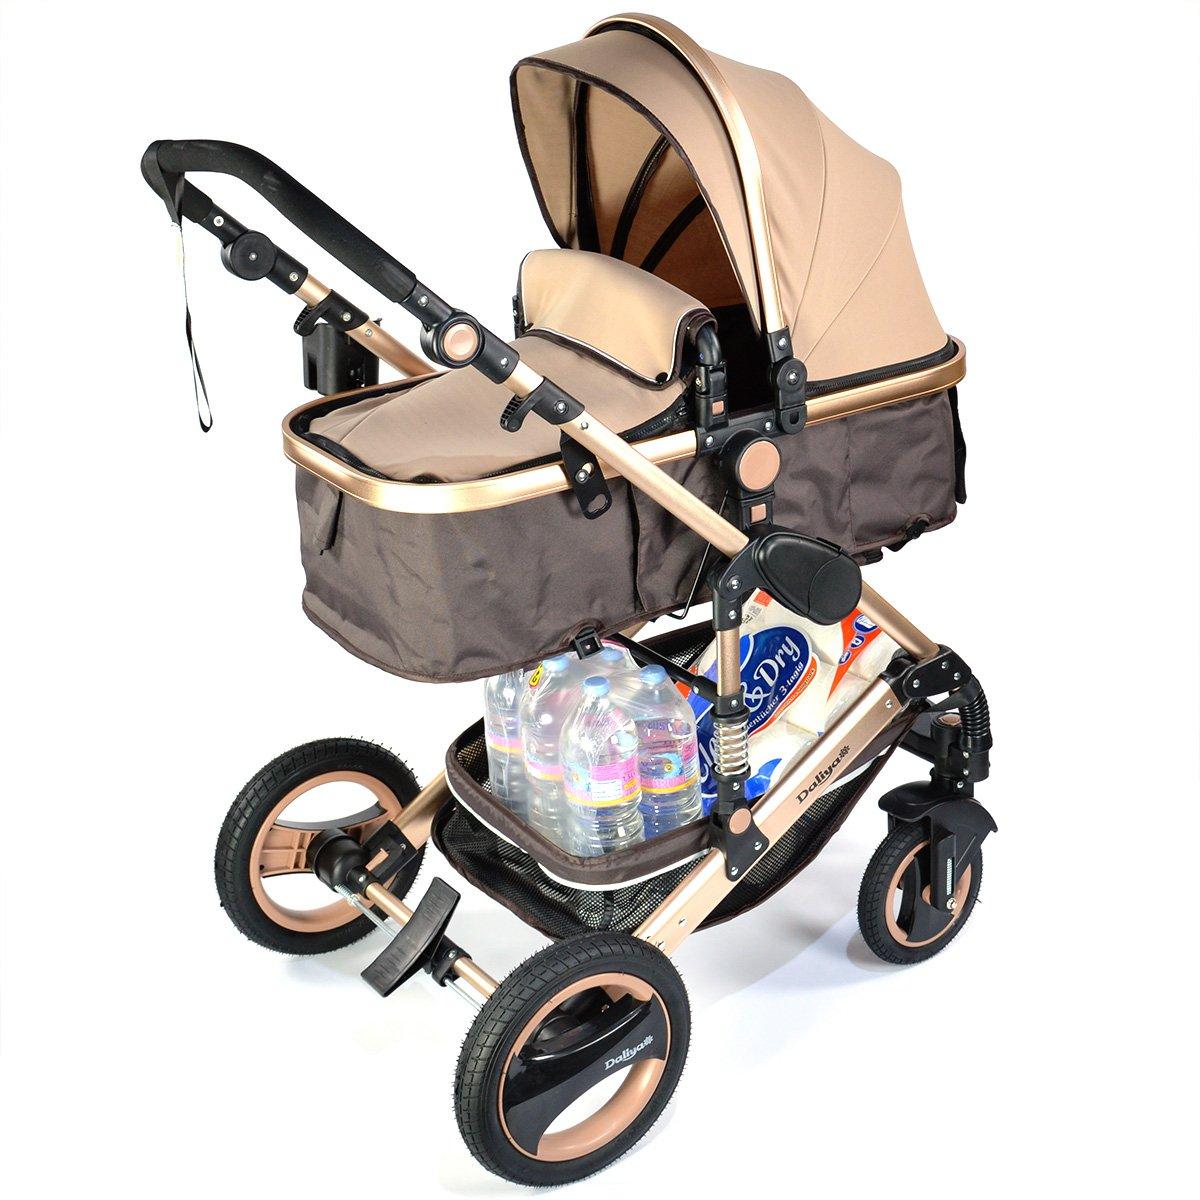 3 in 1 Kinderwagen Bambimo Kombikinderwagen Babyschale Buggy Sportsitz Babywanne Aluminium Rahmen Daliya